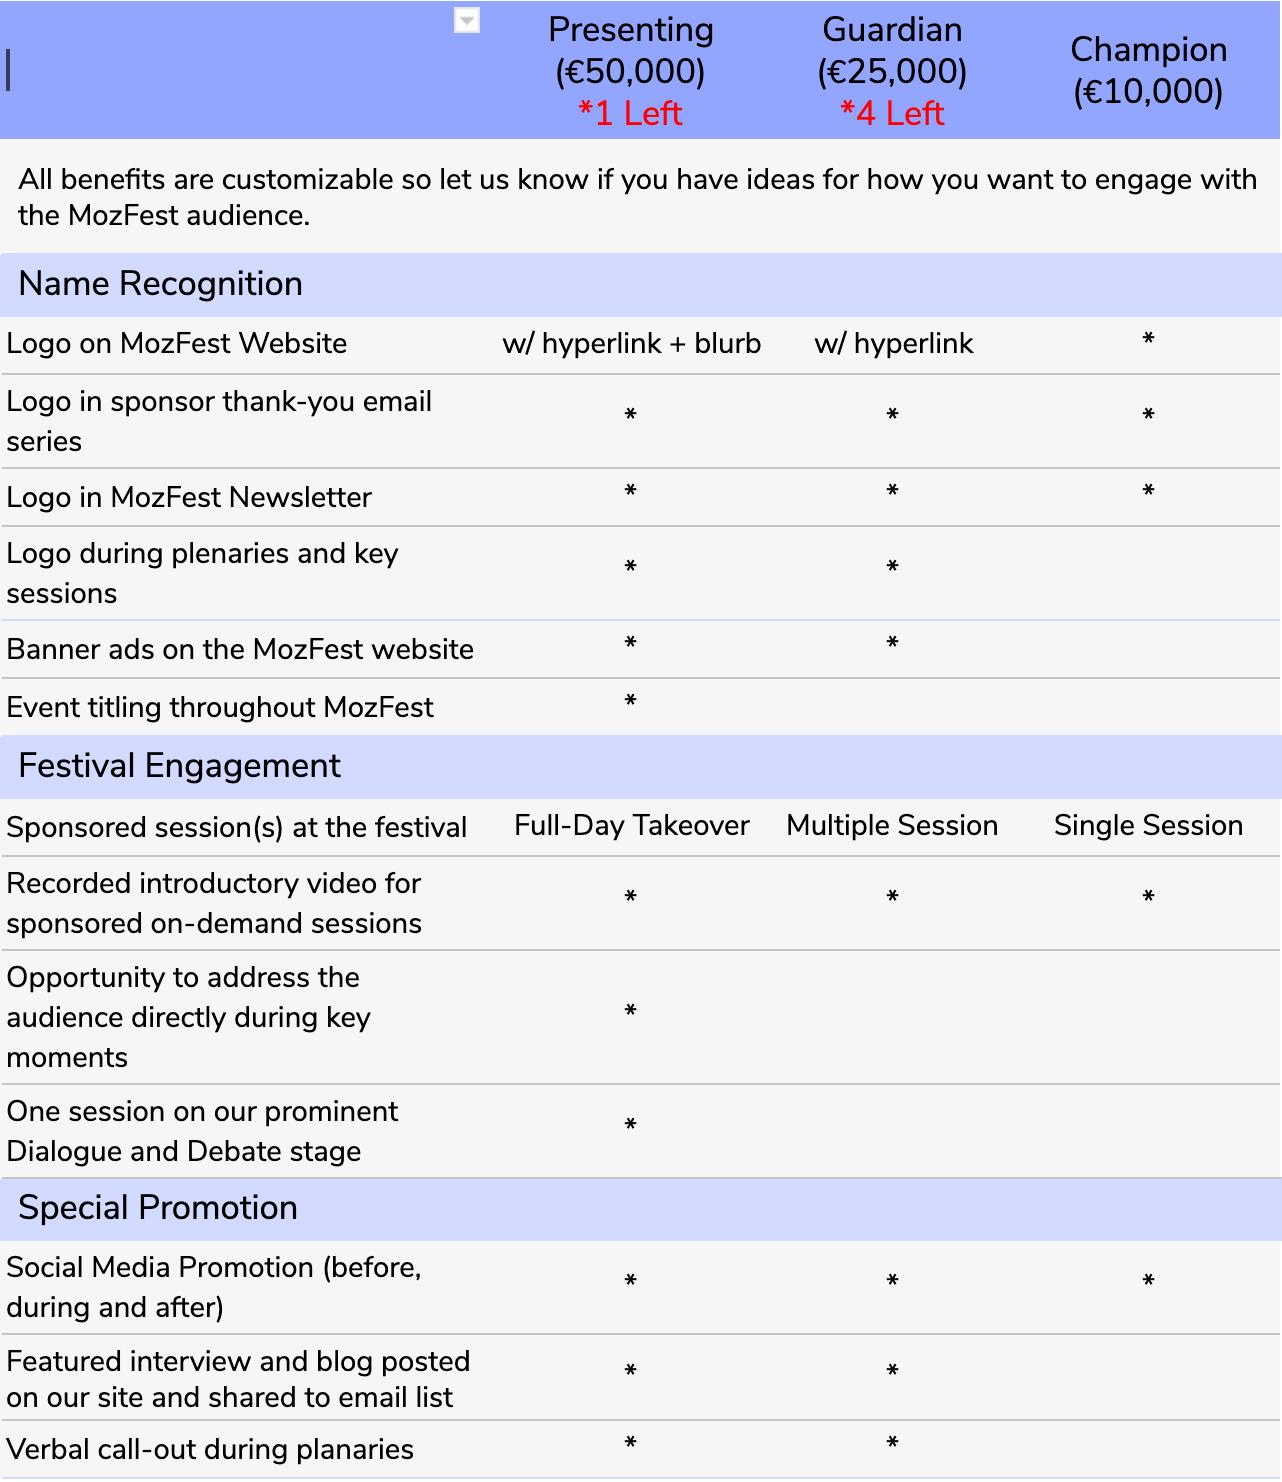 MozFest Sponsorship Benefits Matrix